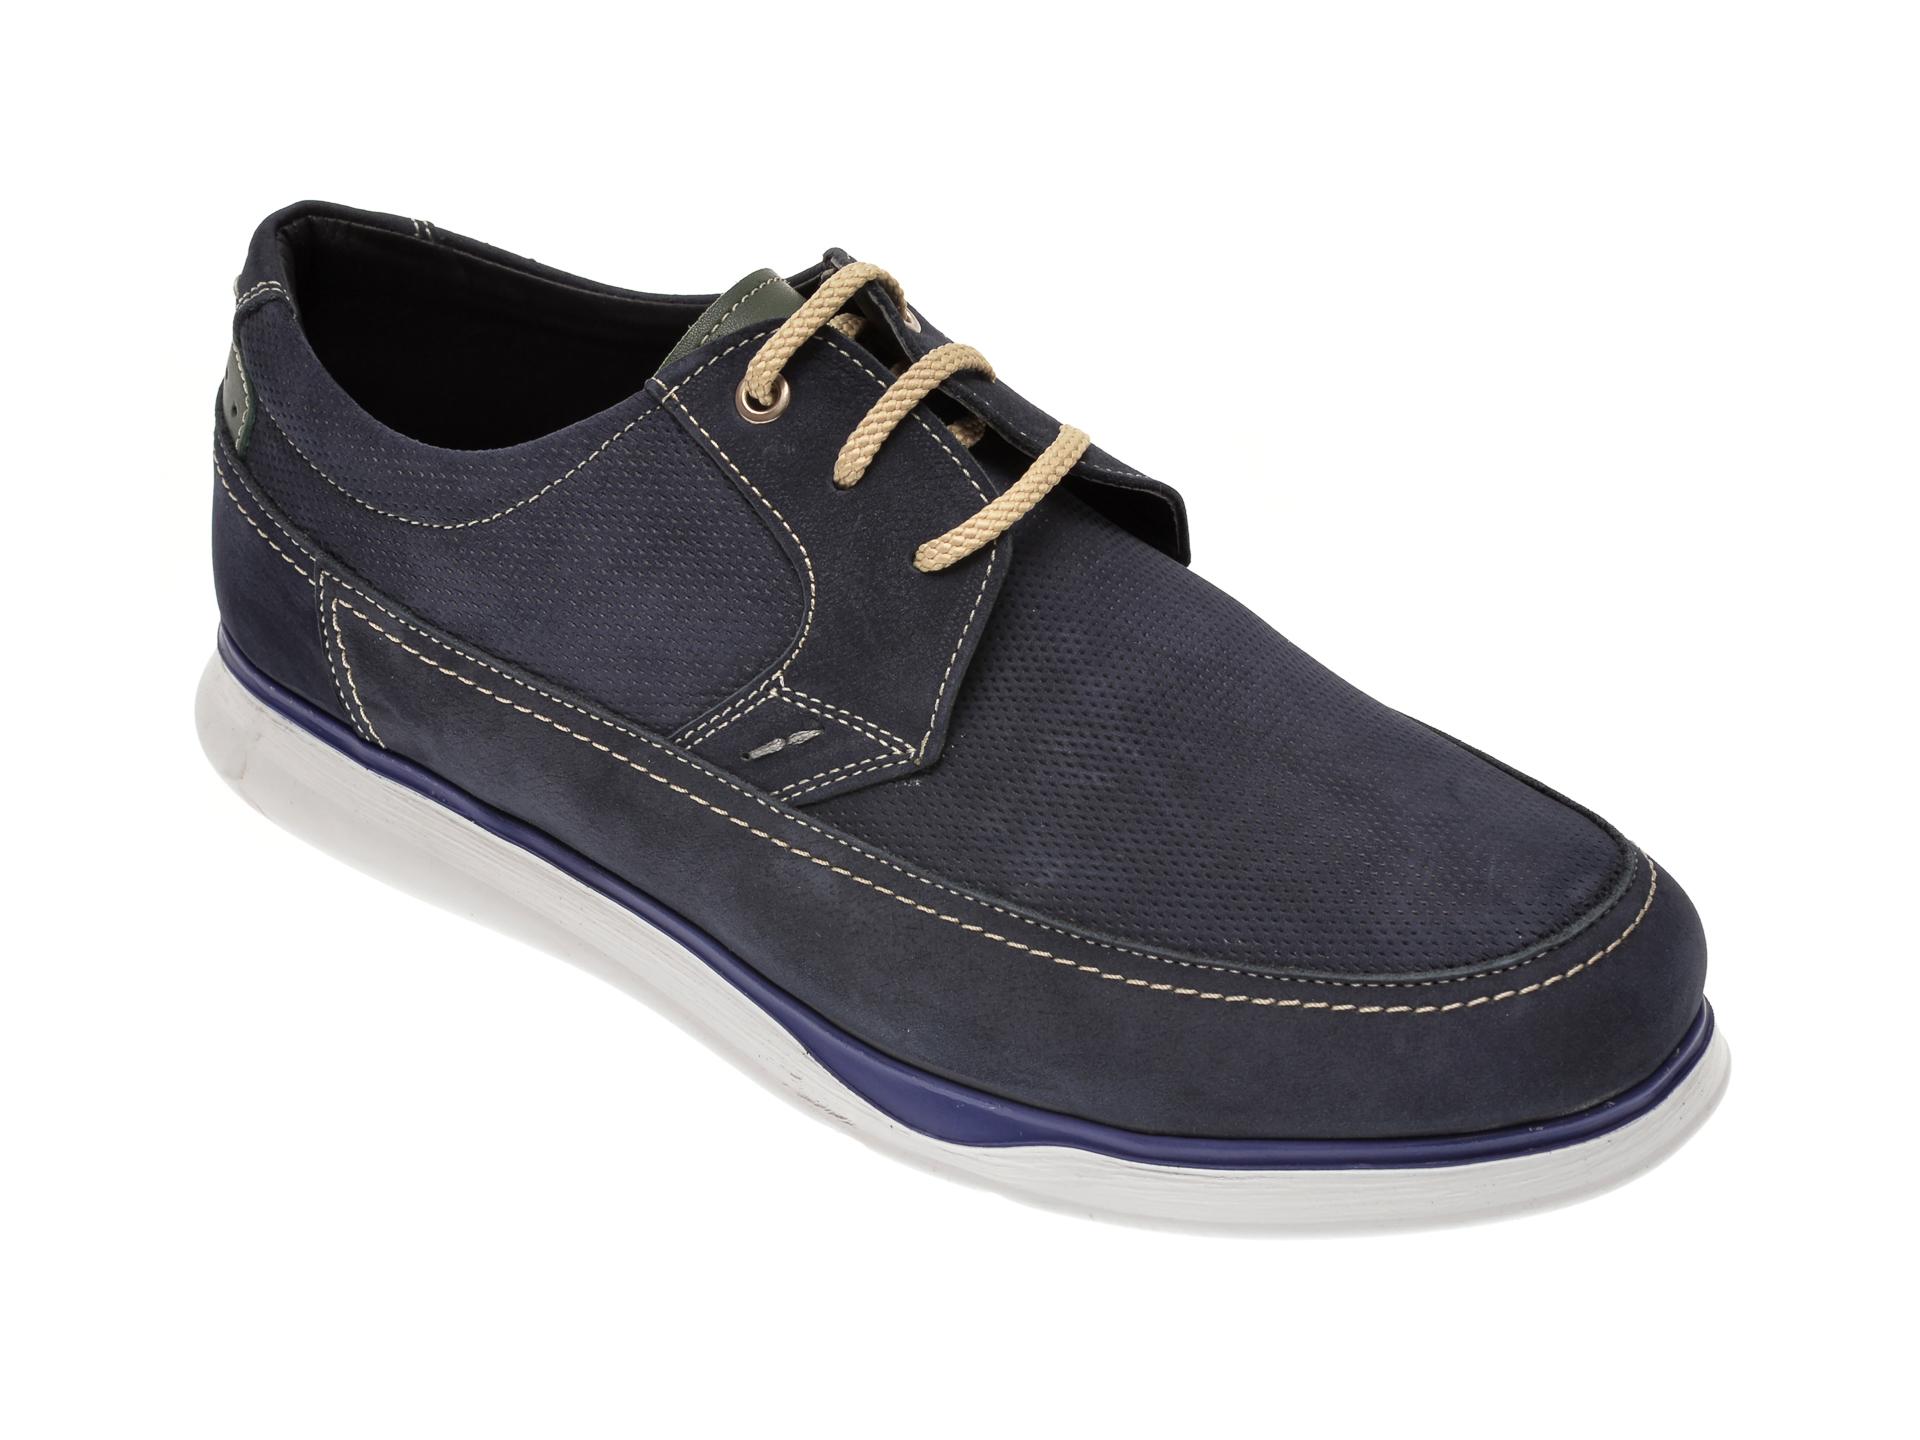 Pantofi OTTER bleumarin, 19332, din piele intoarsa New